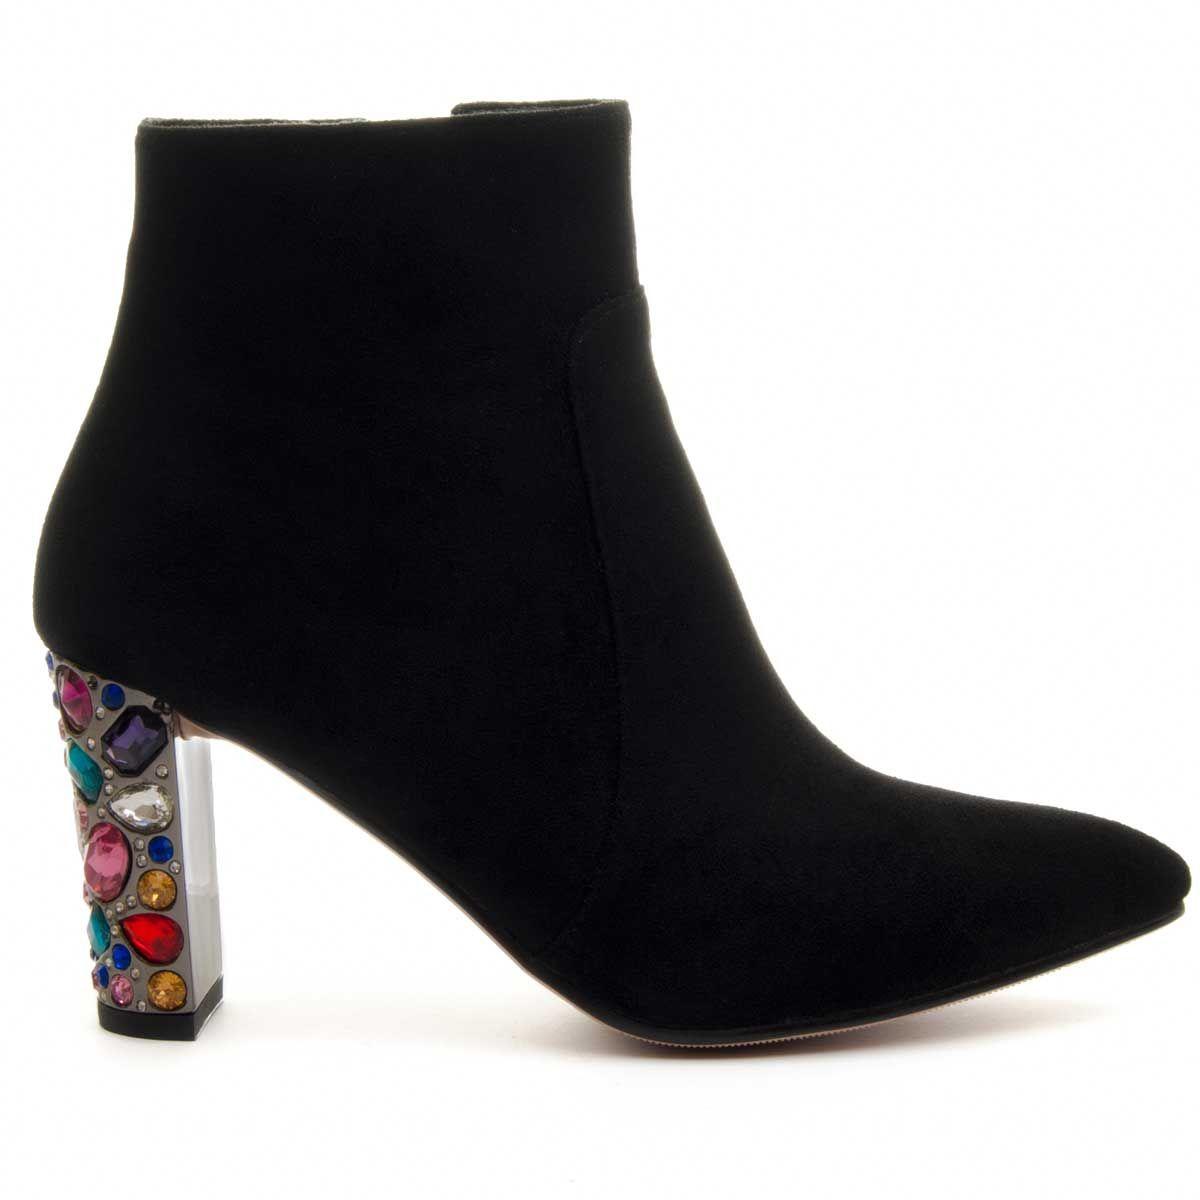 Montevita Jewel Heeled Ankle Boot in Black